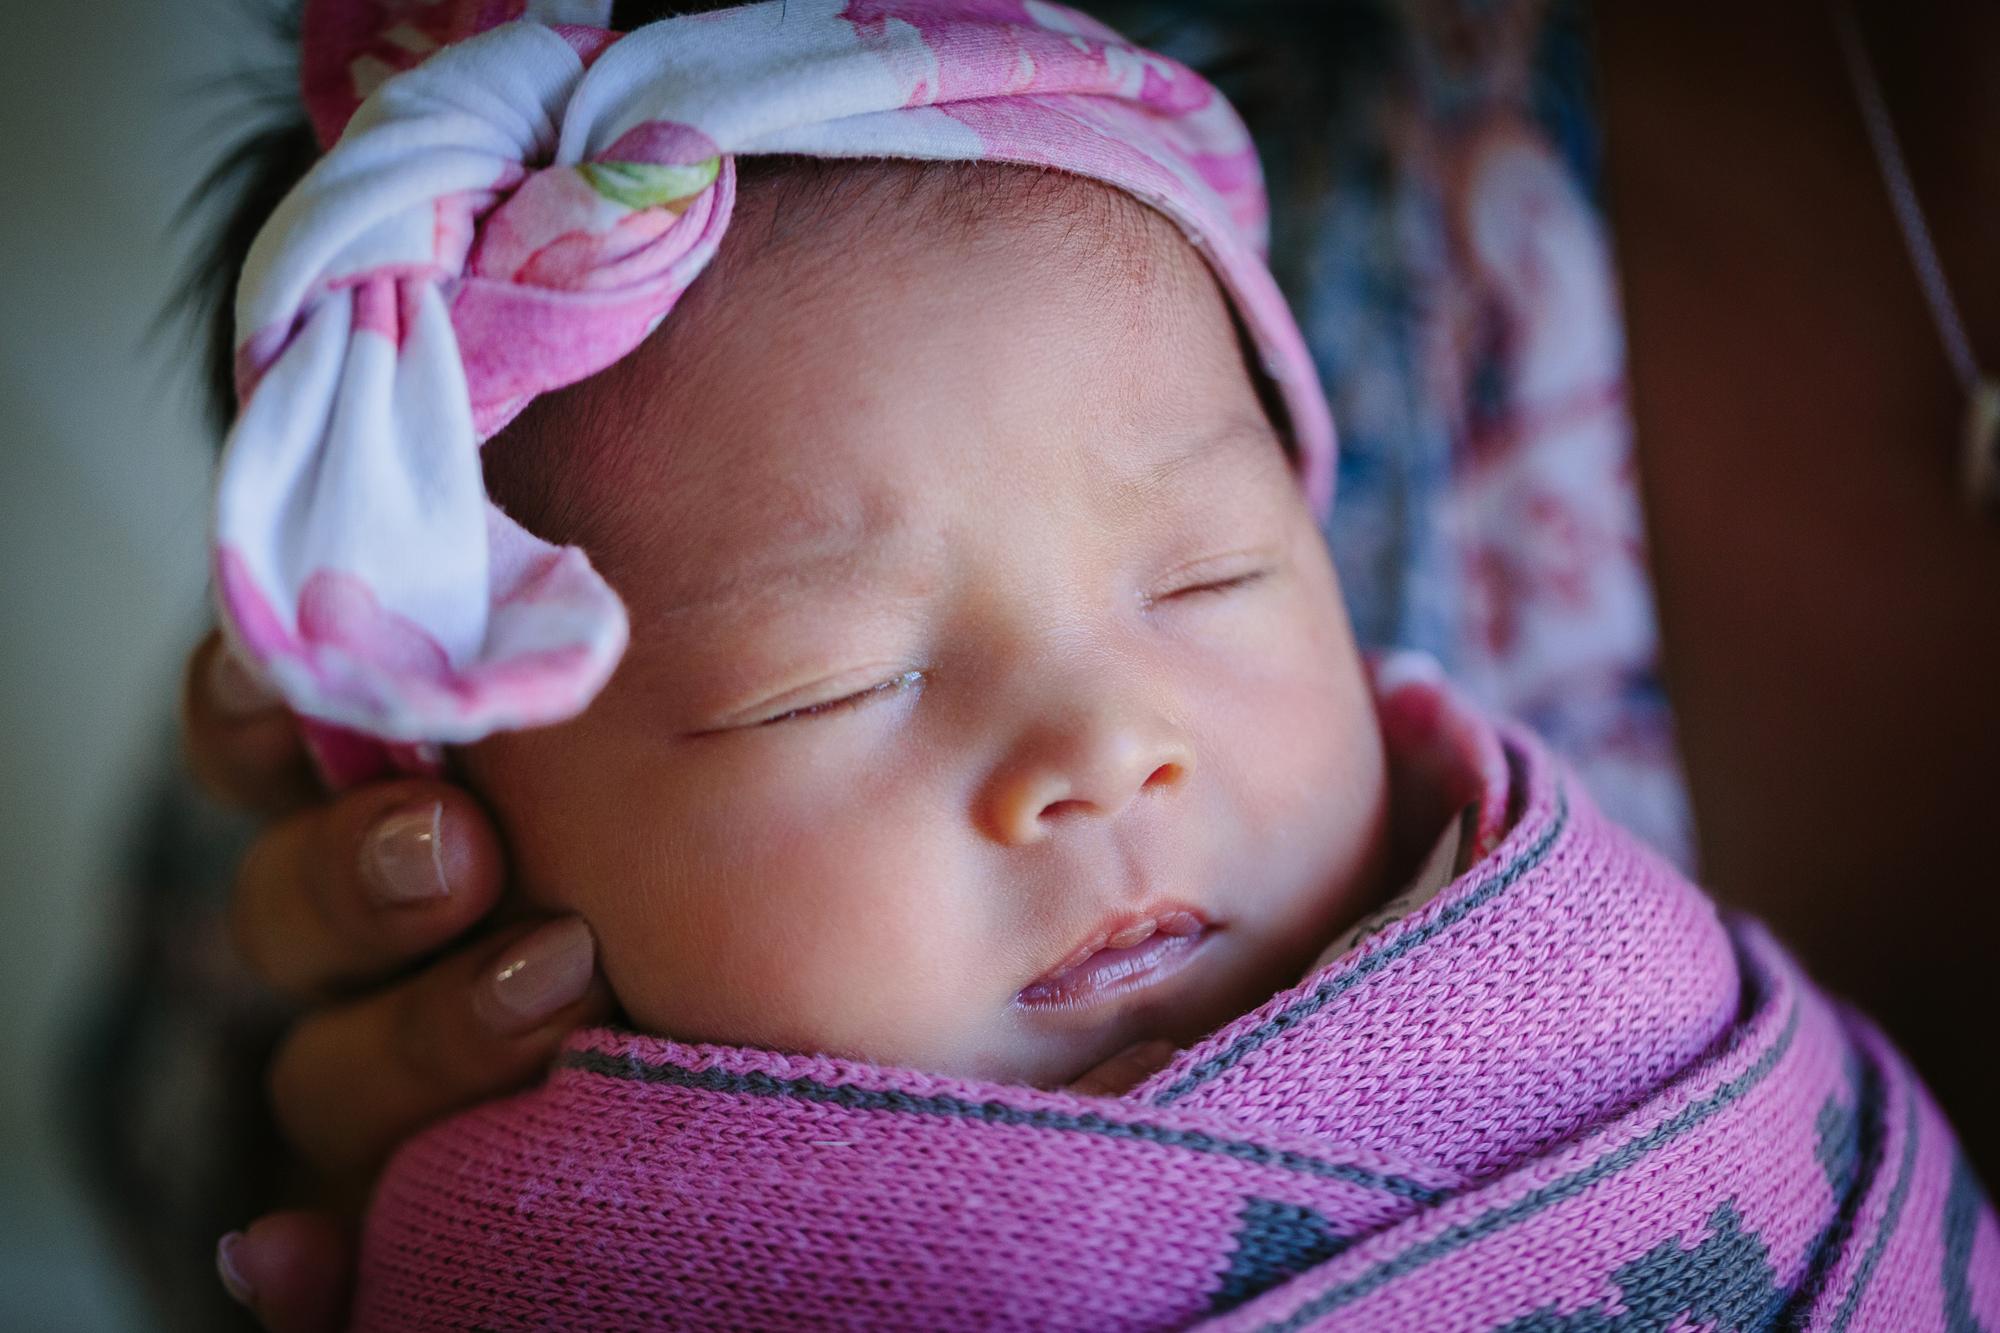 001_Newborn Lifetsyle_Zara_Sunlight Photography.jpg